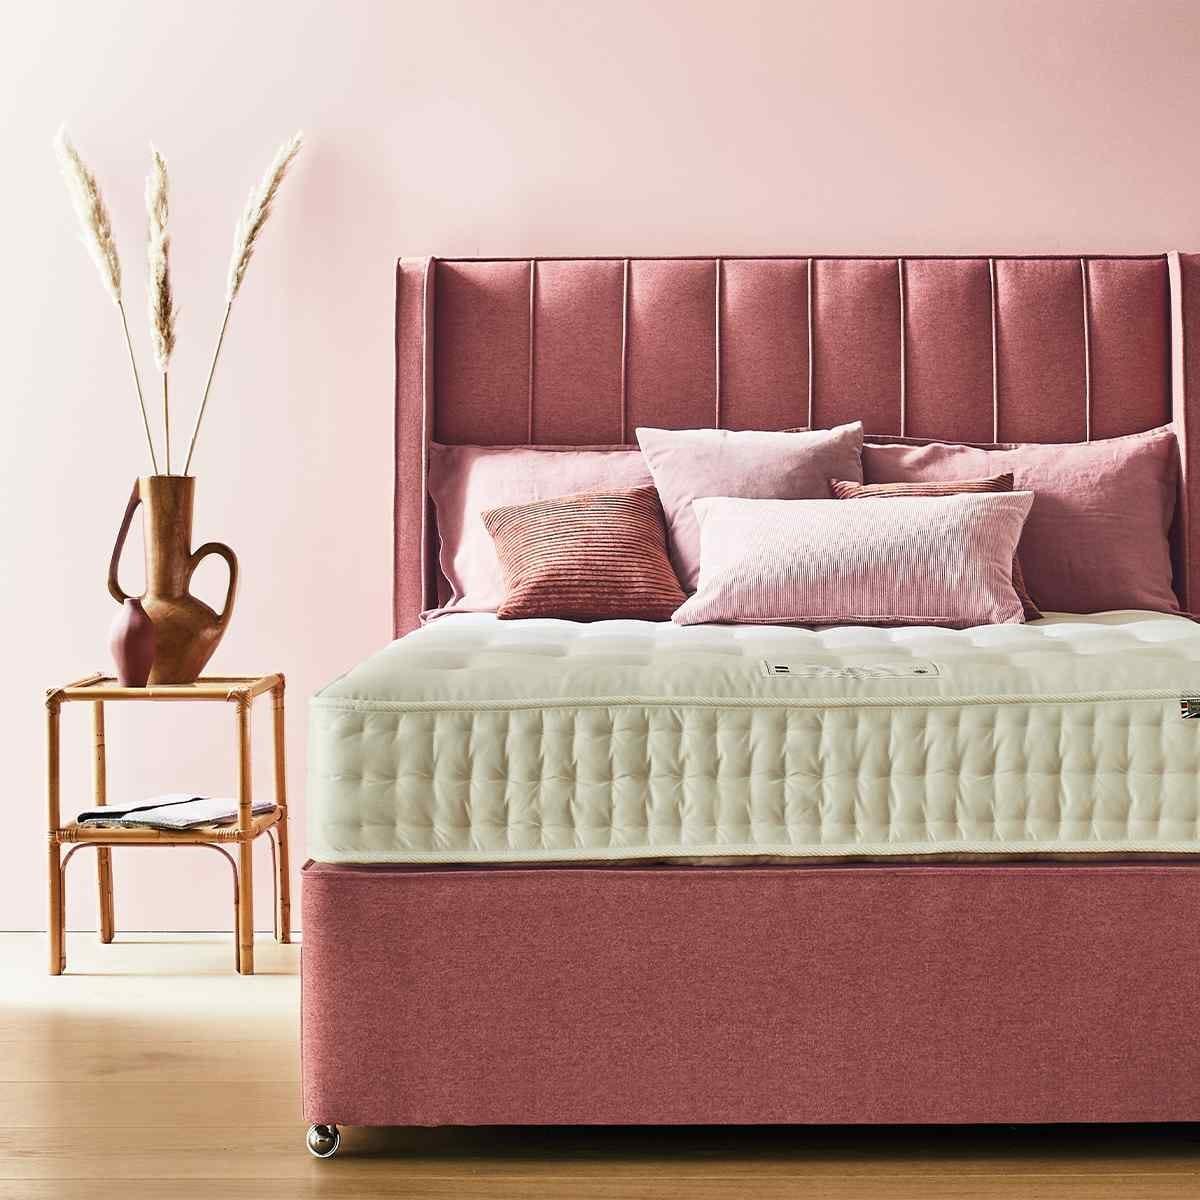 Sleepeezee Wool Comfort Serenity 1200 King Mattress